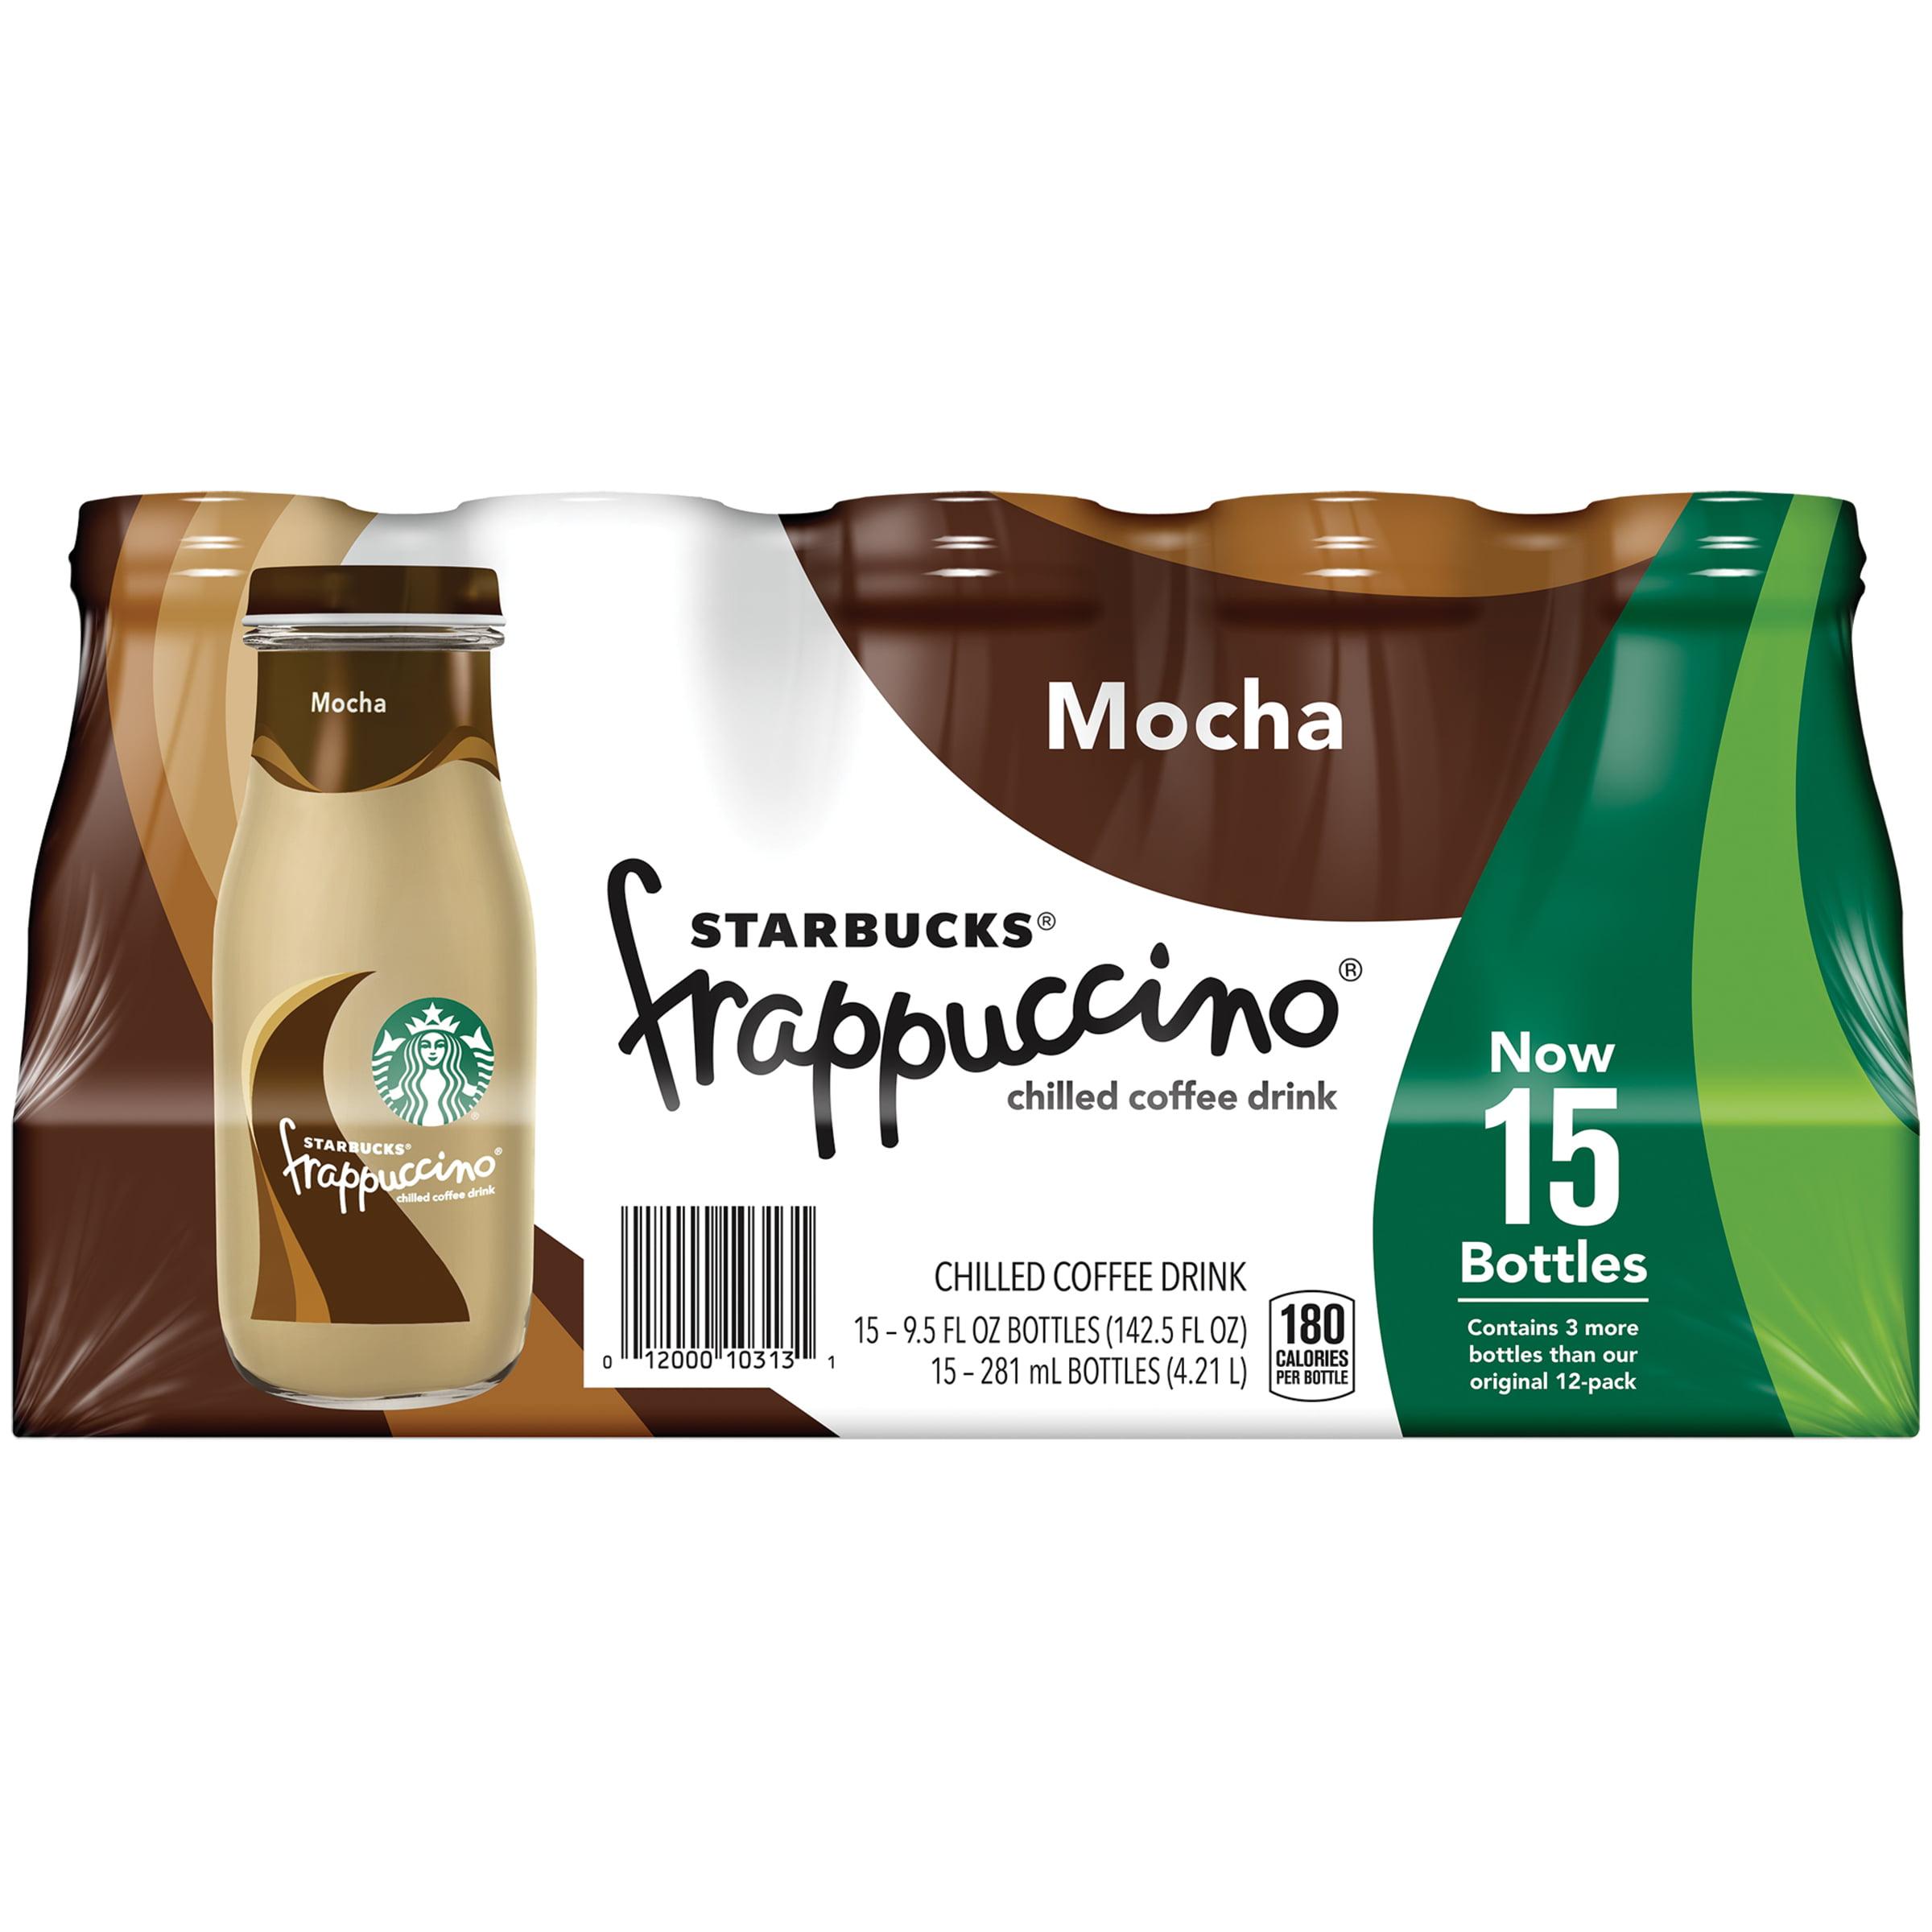 Starbucks Mocha Frappuccino 9.5 fl oz Chilled Coffee Drink 6 Pack